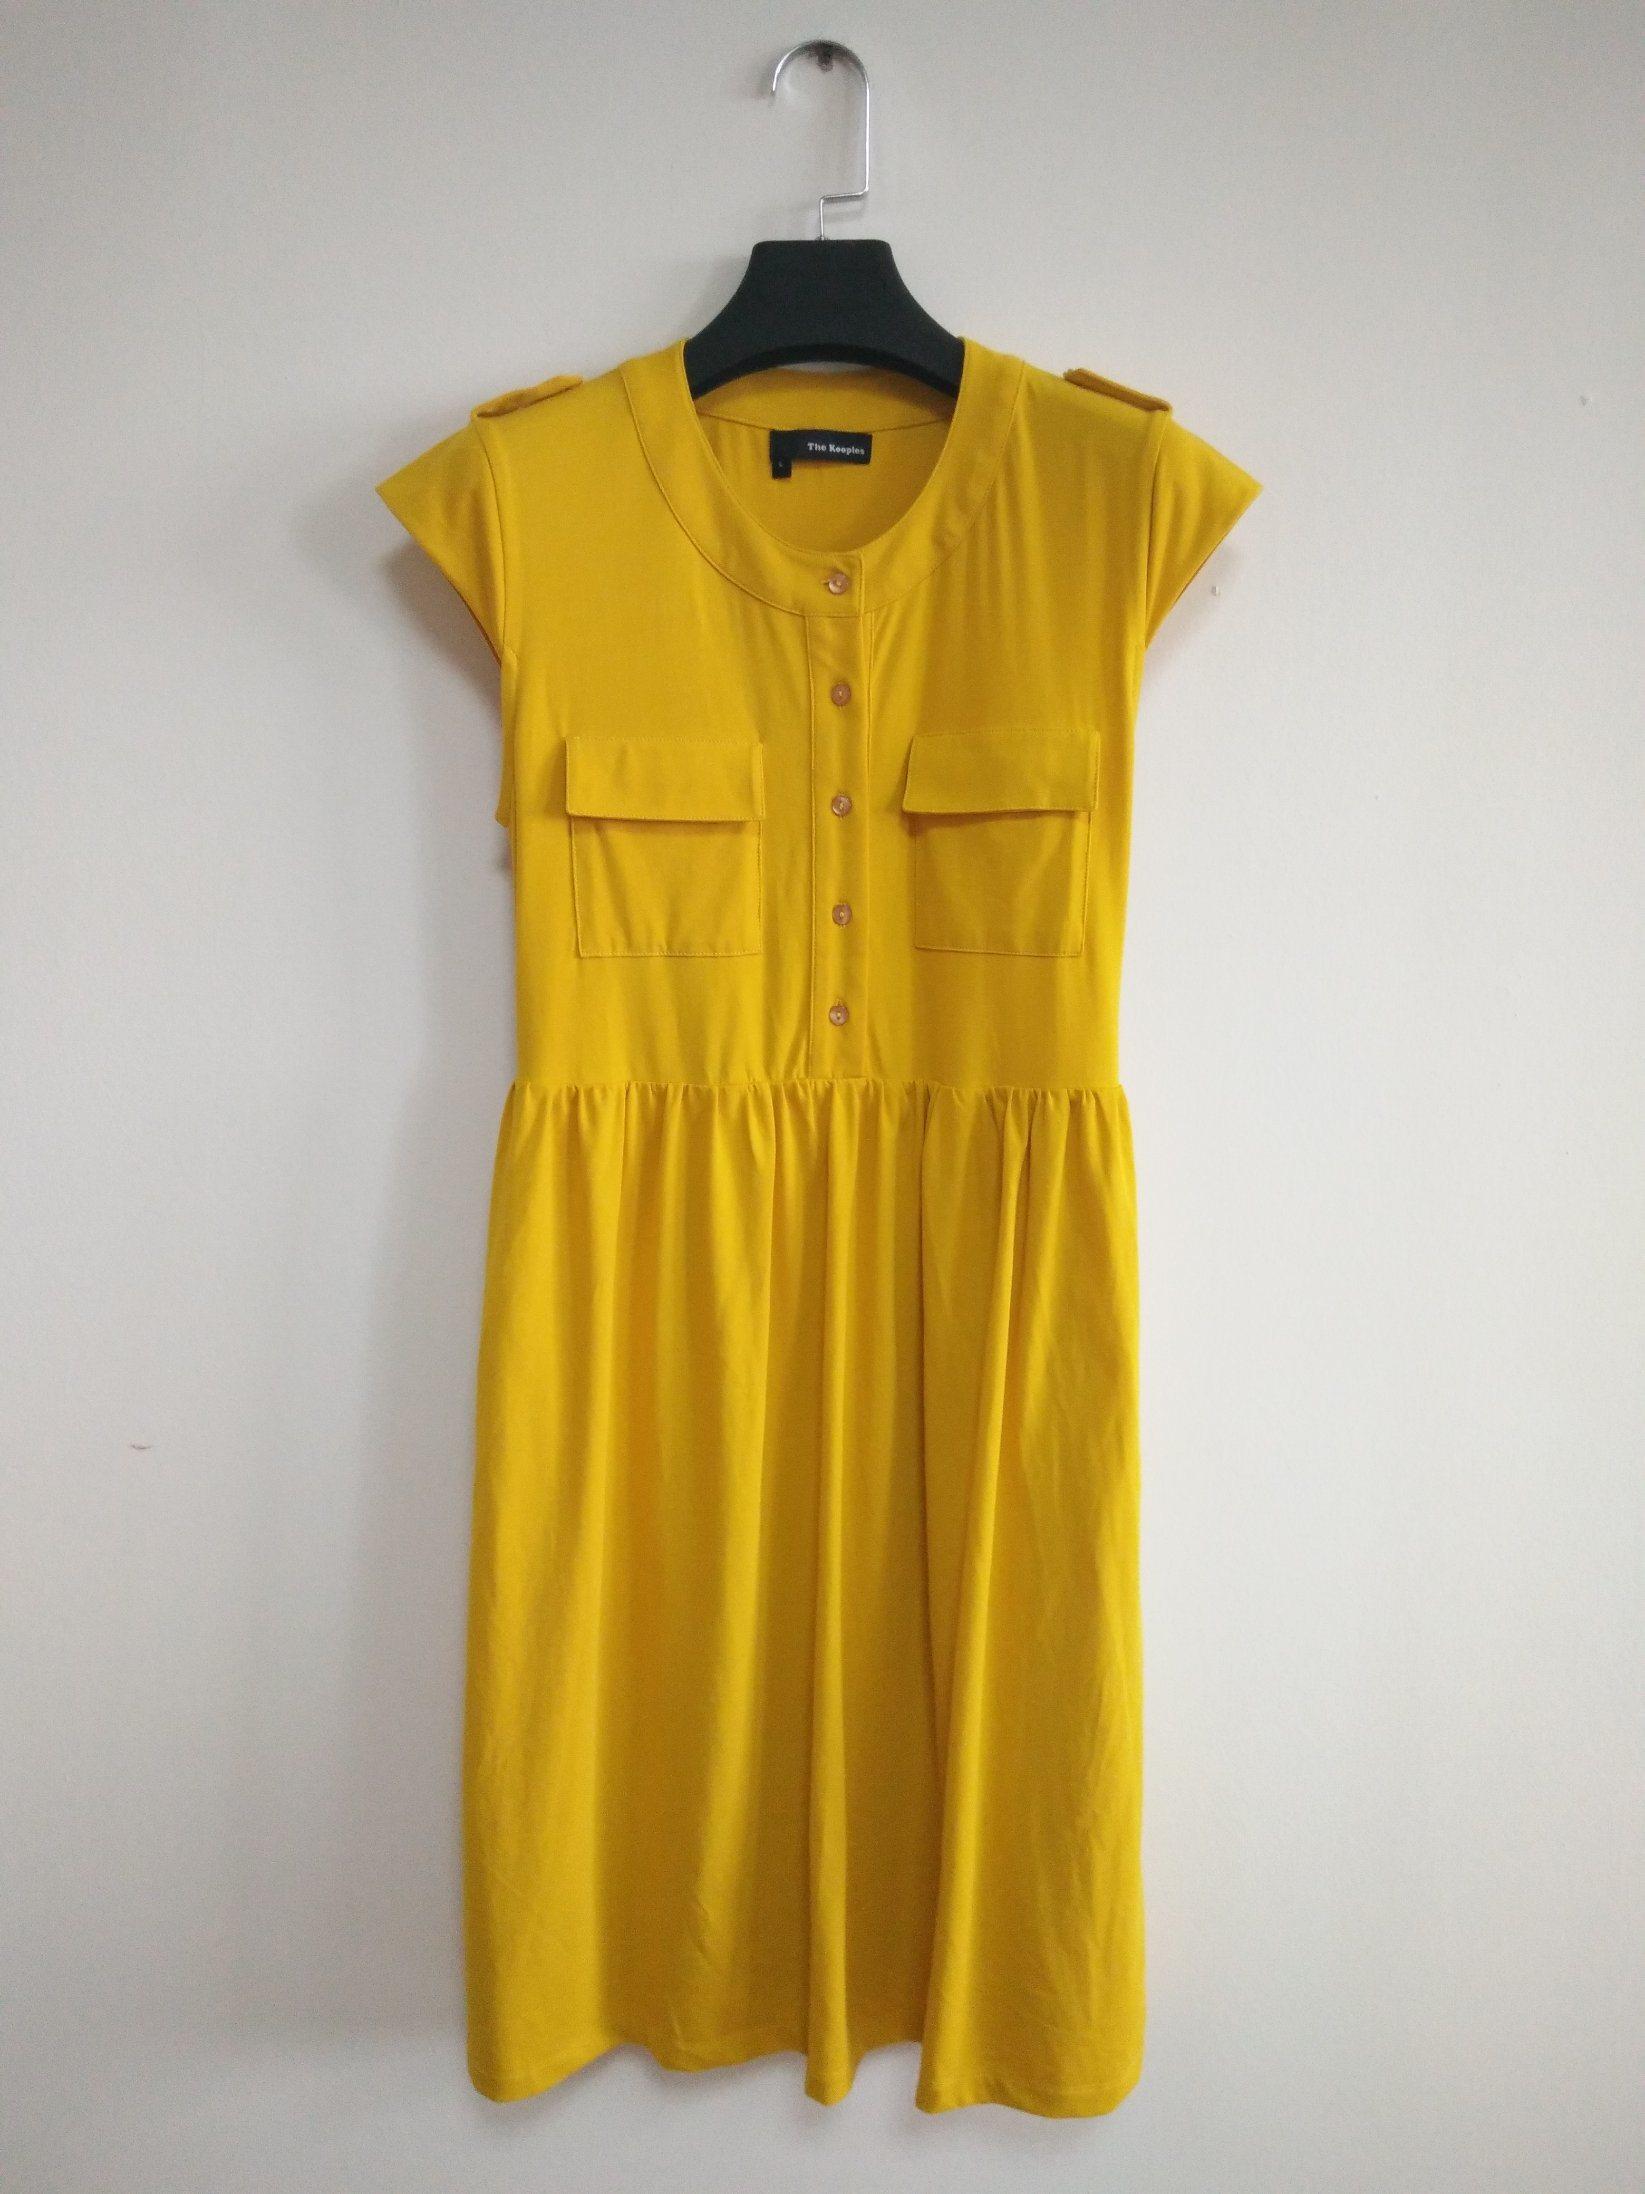 2018summer Lady′s Dress, Yellow, Lovely, Pretty, Beautiful, Nice